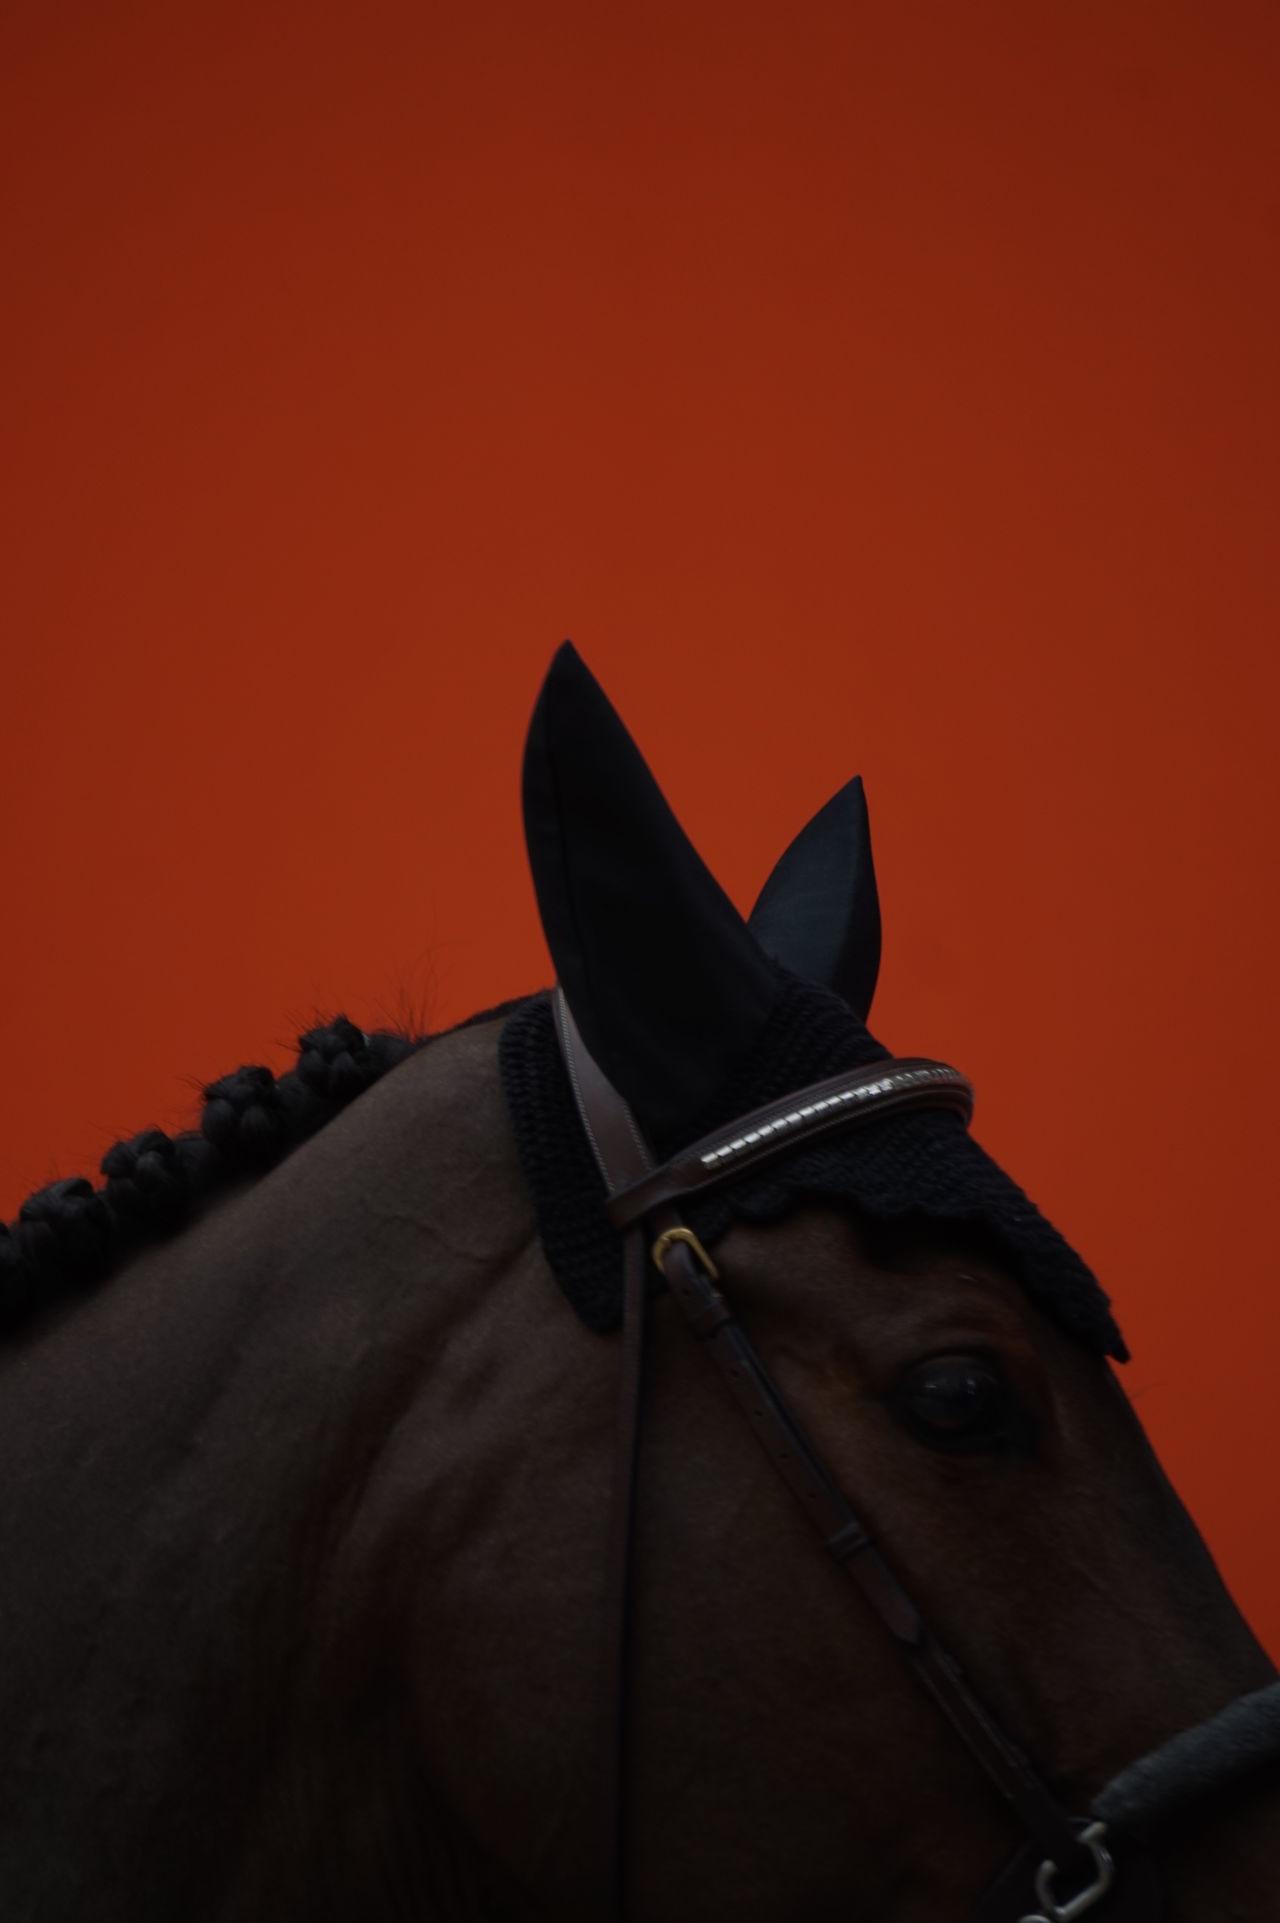 Close-up Detail EyeEmNewHere Horse Orange Piano Moments Profile The Week On EyeEm Fresh On Market 2017